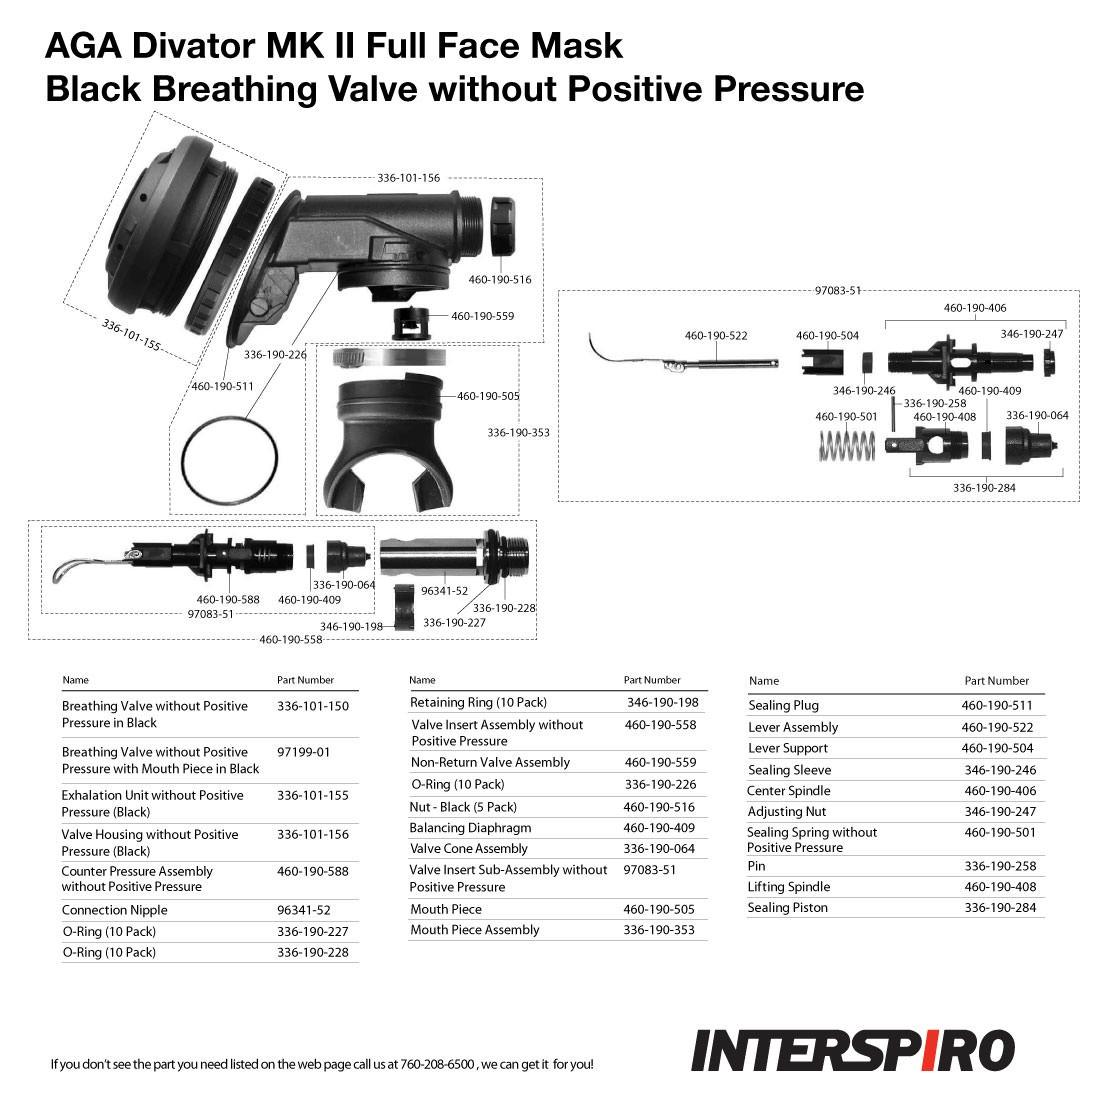 Interspiro Aga Divator Mk Ii Full Face Mask With Demand